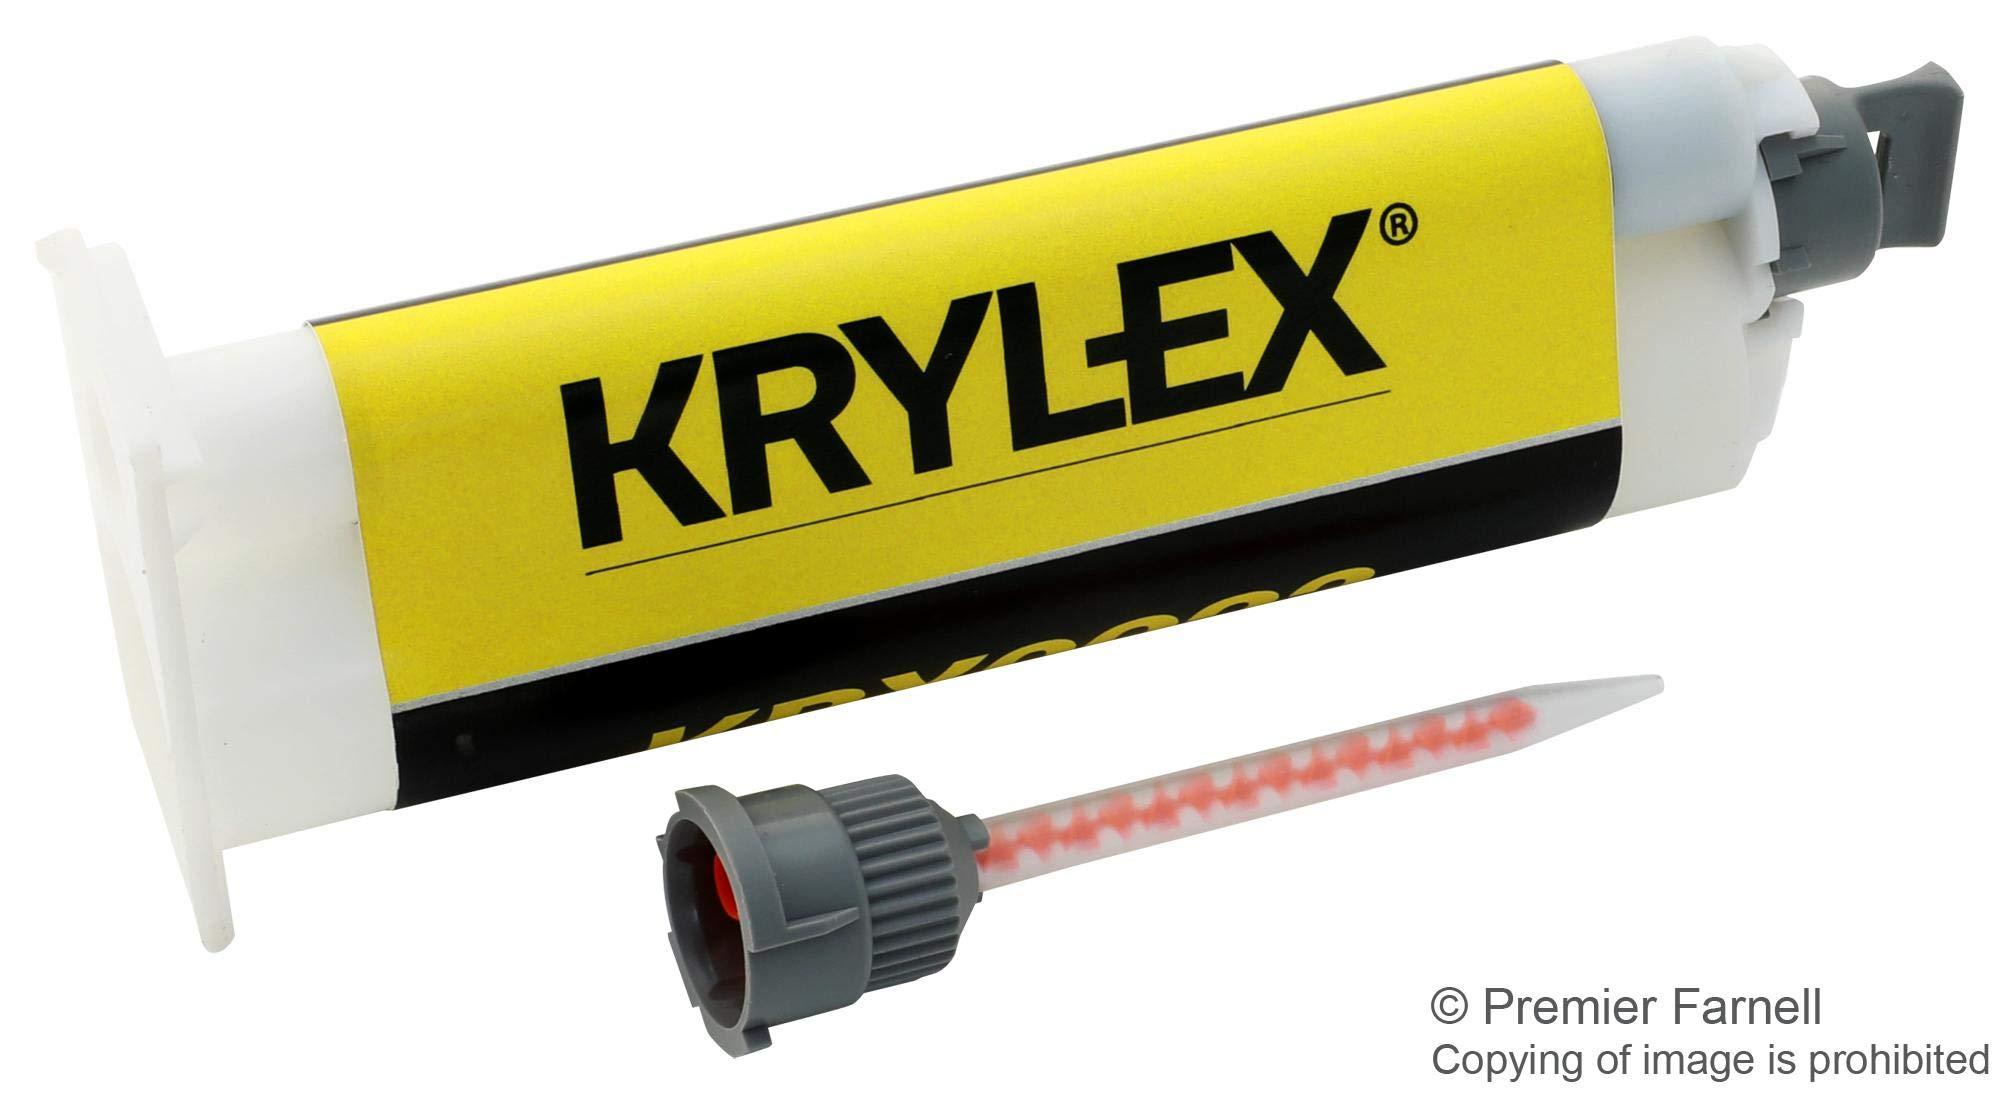 KBX0923, 50G - INSTANT ADHESIVE, CYANOACRYLATE, 50G (Pack of 2) (KBX0923, 50G)